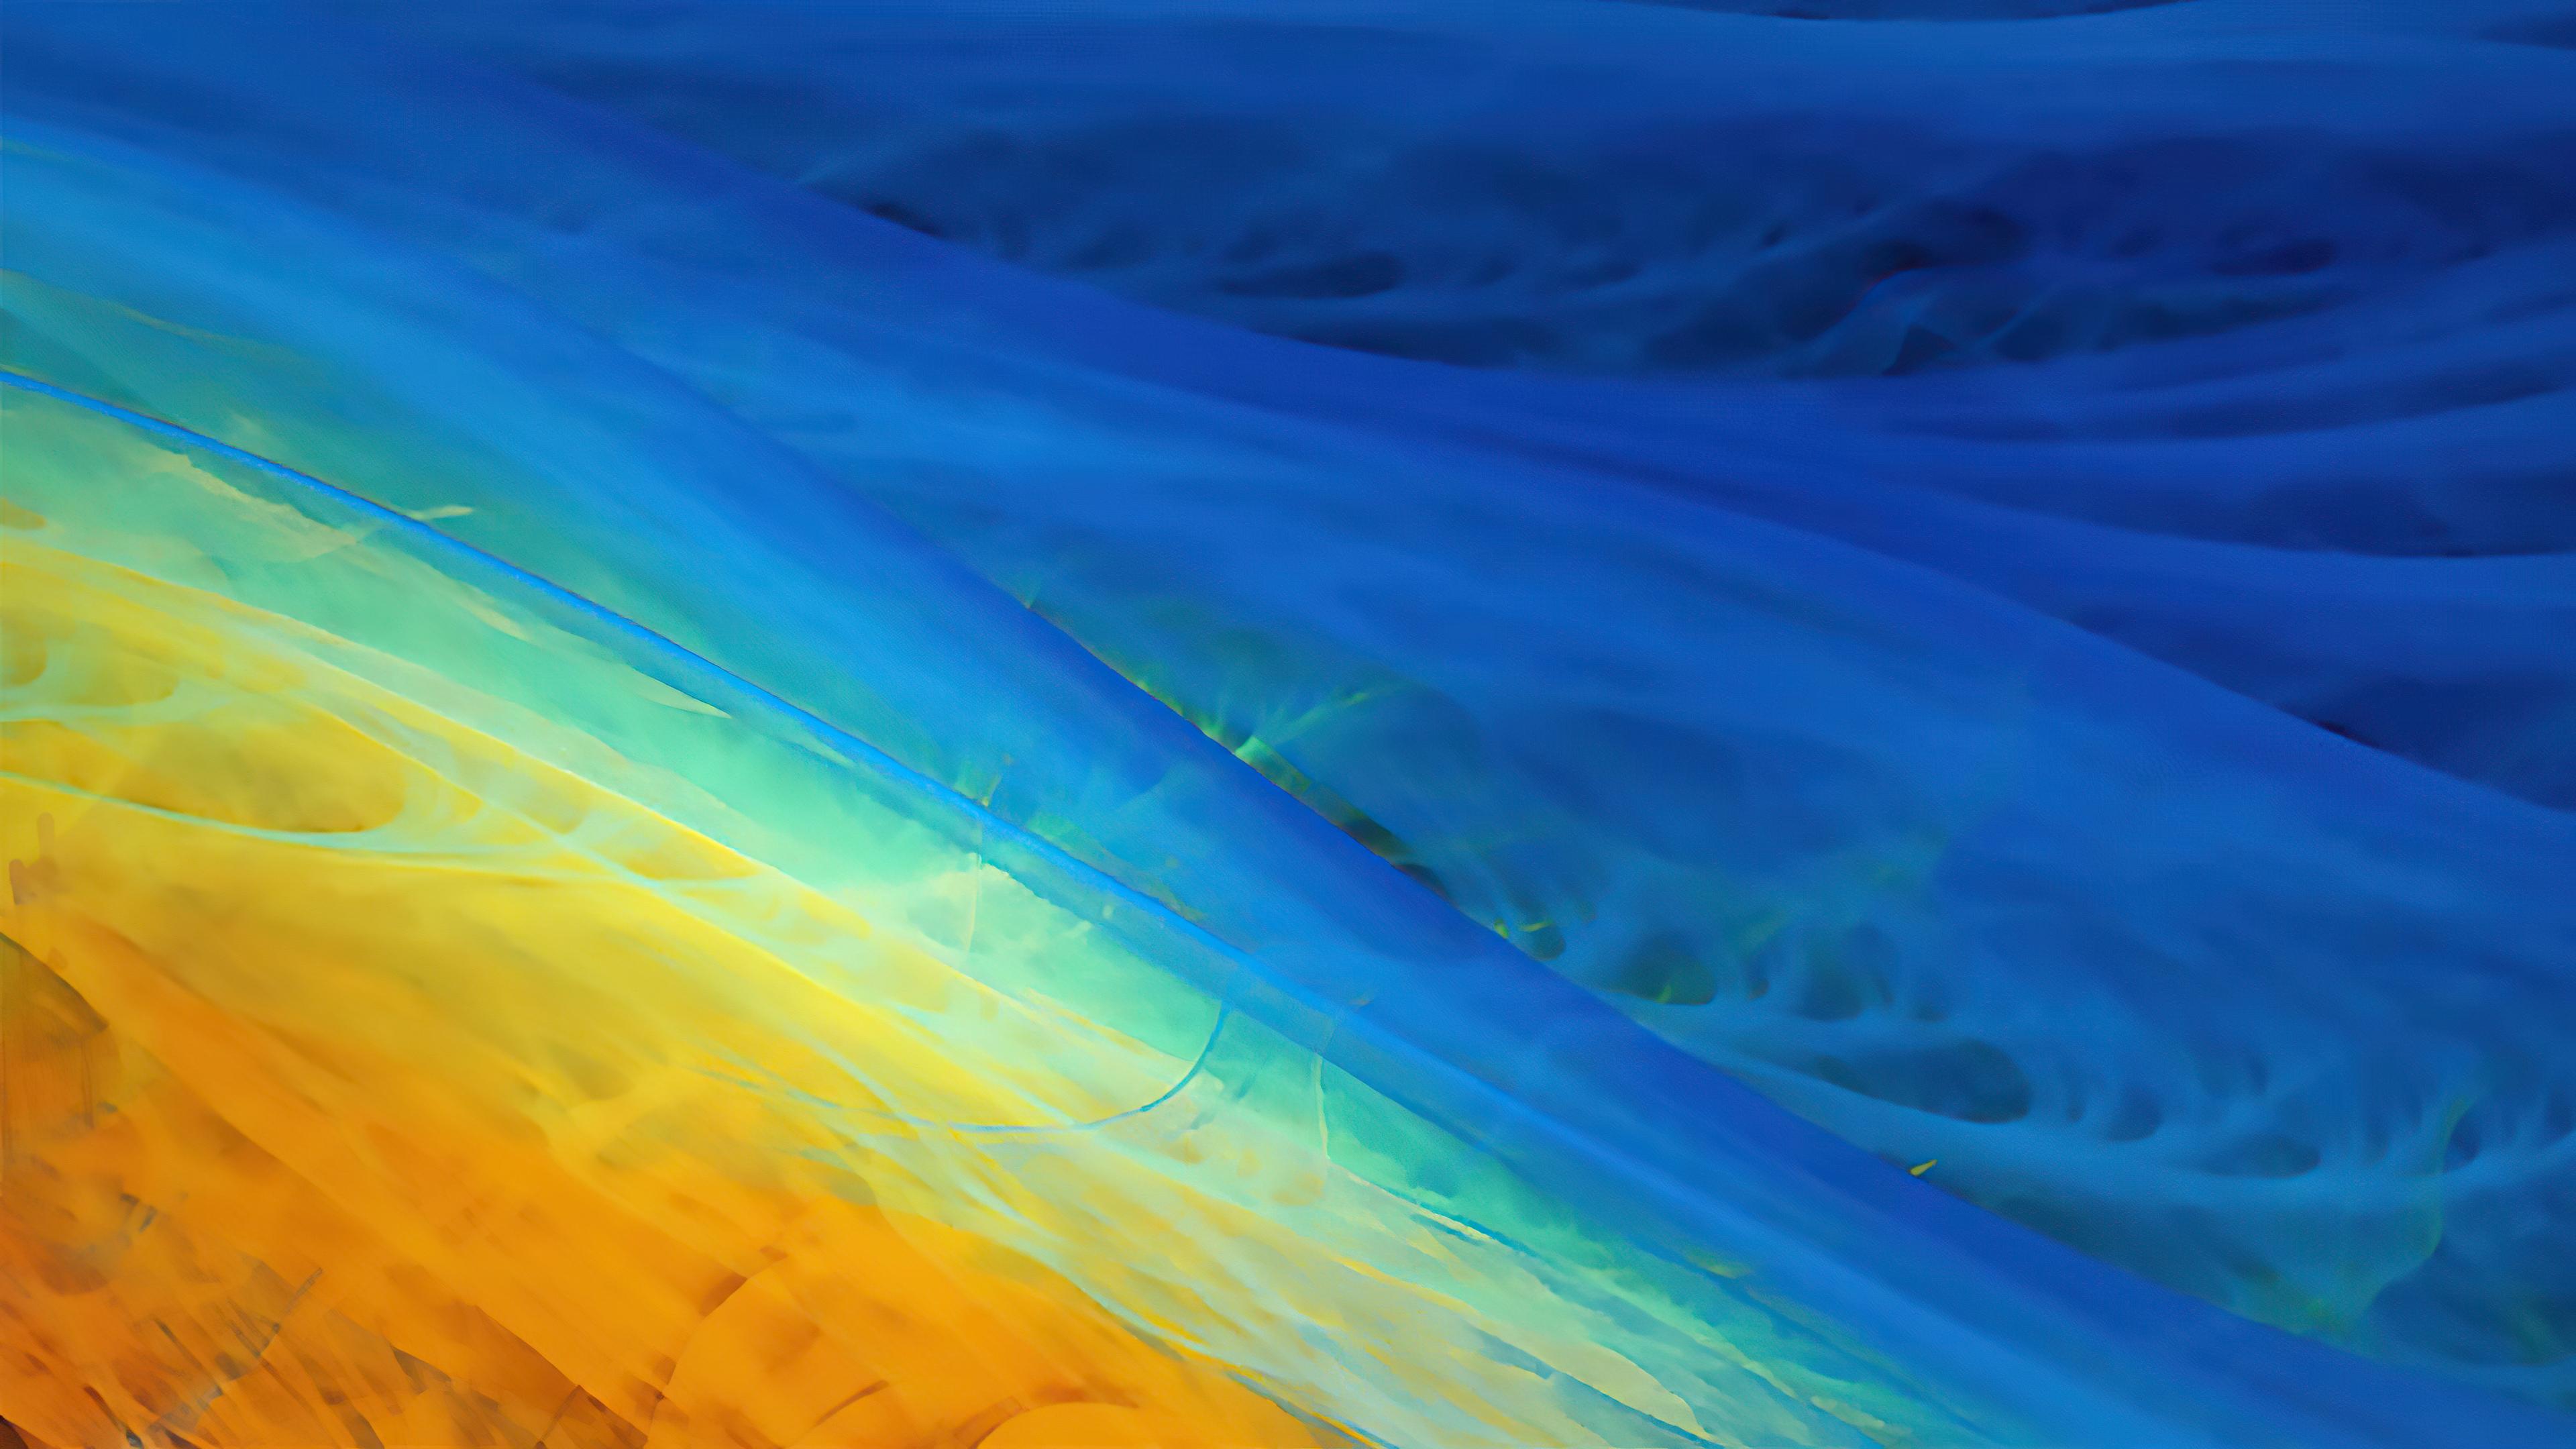 color splash abstract 1596928102 - Color Splash Abstract -